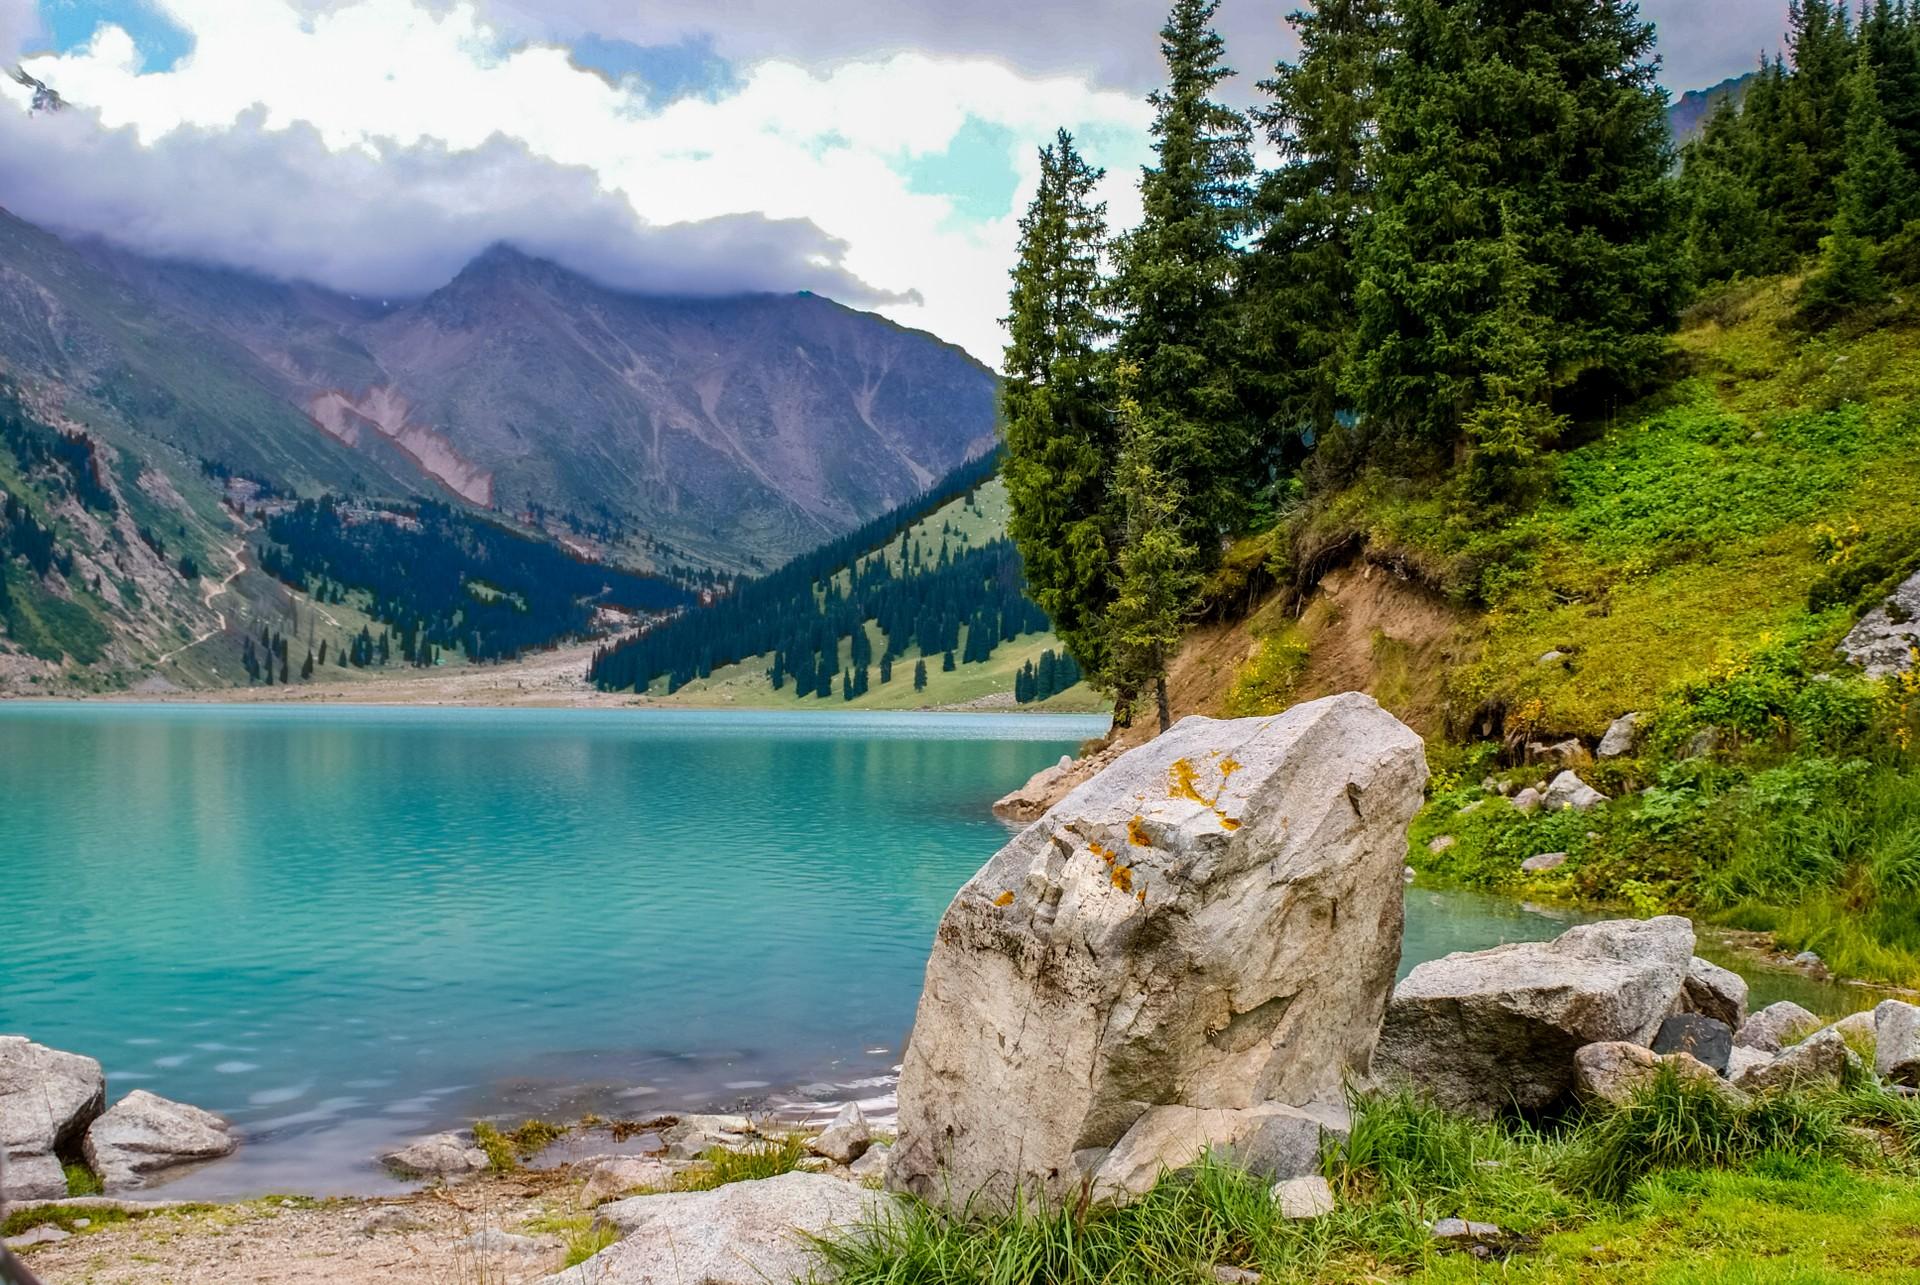 Almaty Lake in the Tien Shan Mountains, Kazakhstan